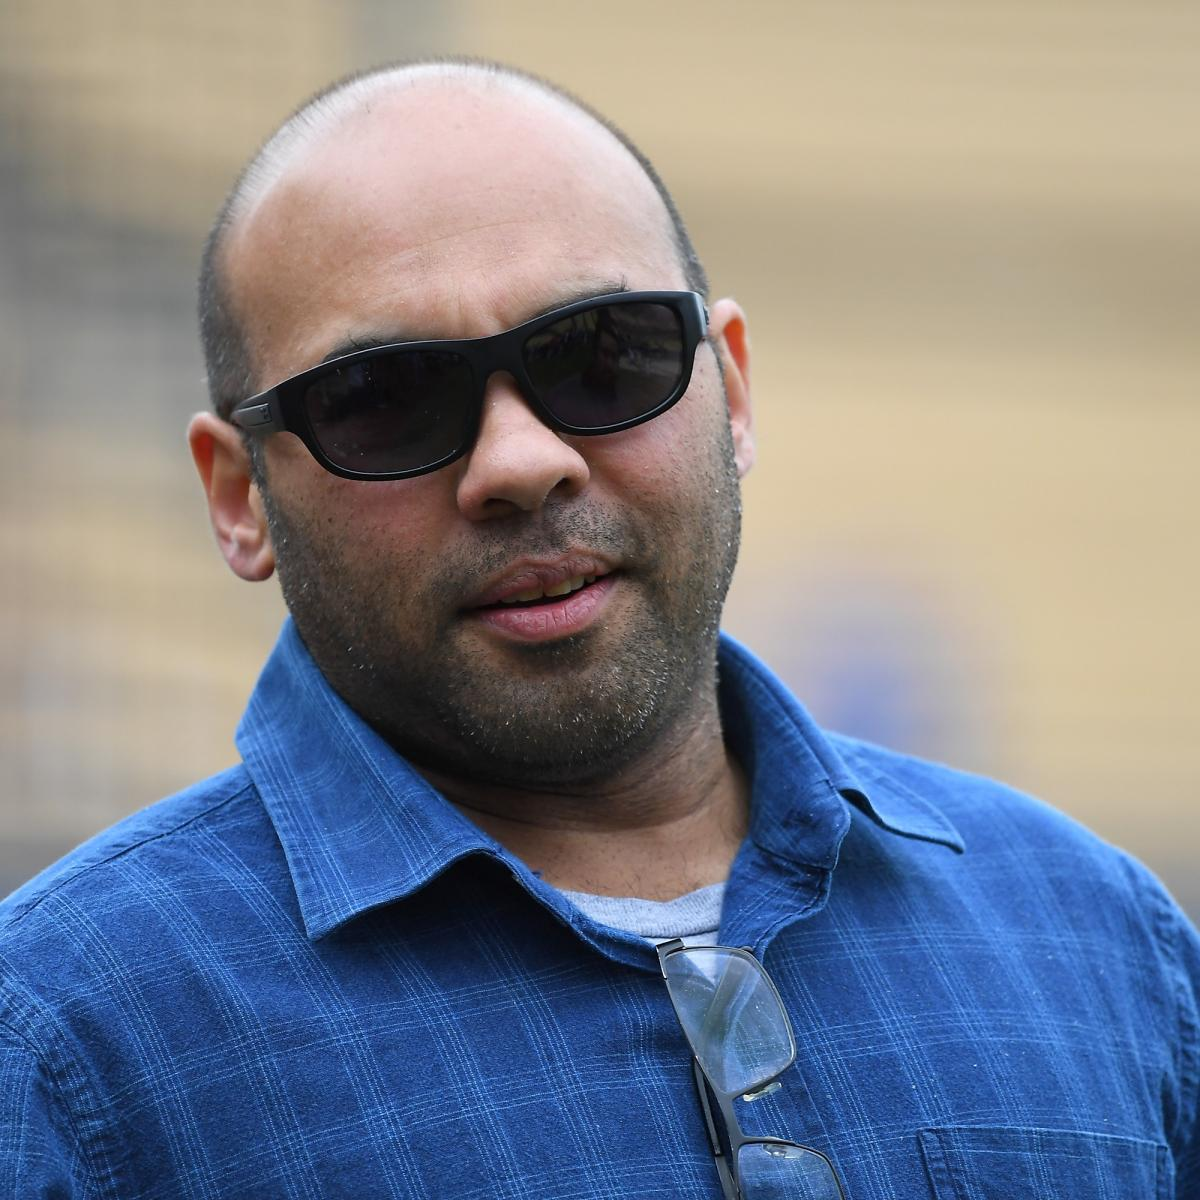 Giants' Farhan Zaidi on Scottsdale Councilman's Mask Comments: 'F--k That Guy'